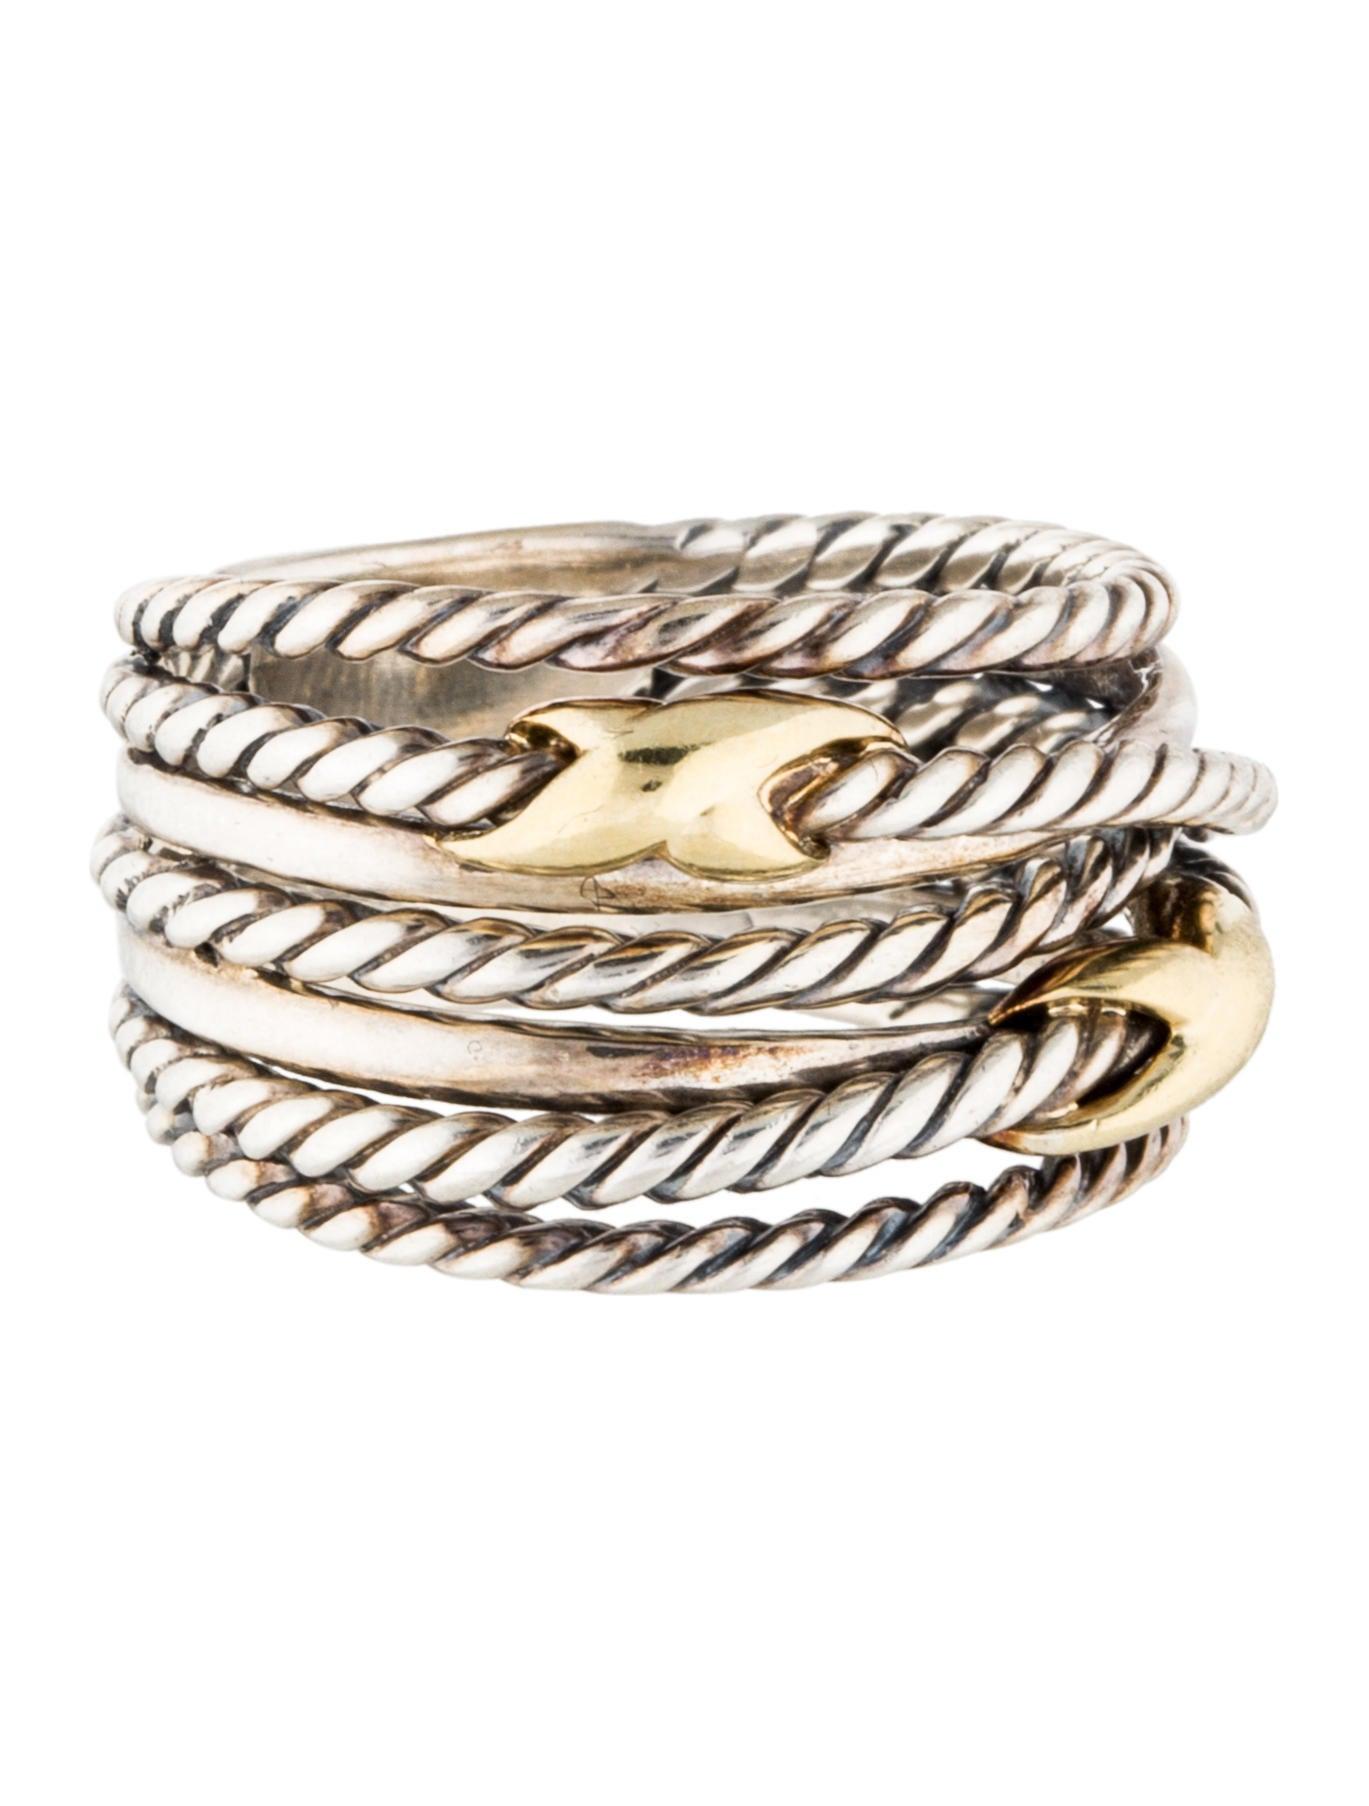 David yurman double x crossover ring rings dvy37671 for David yurman inspired jewelry rings